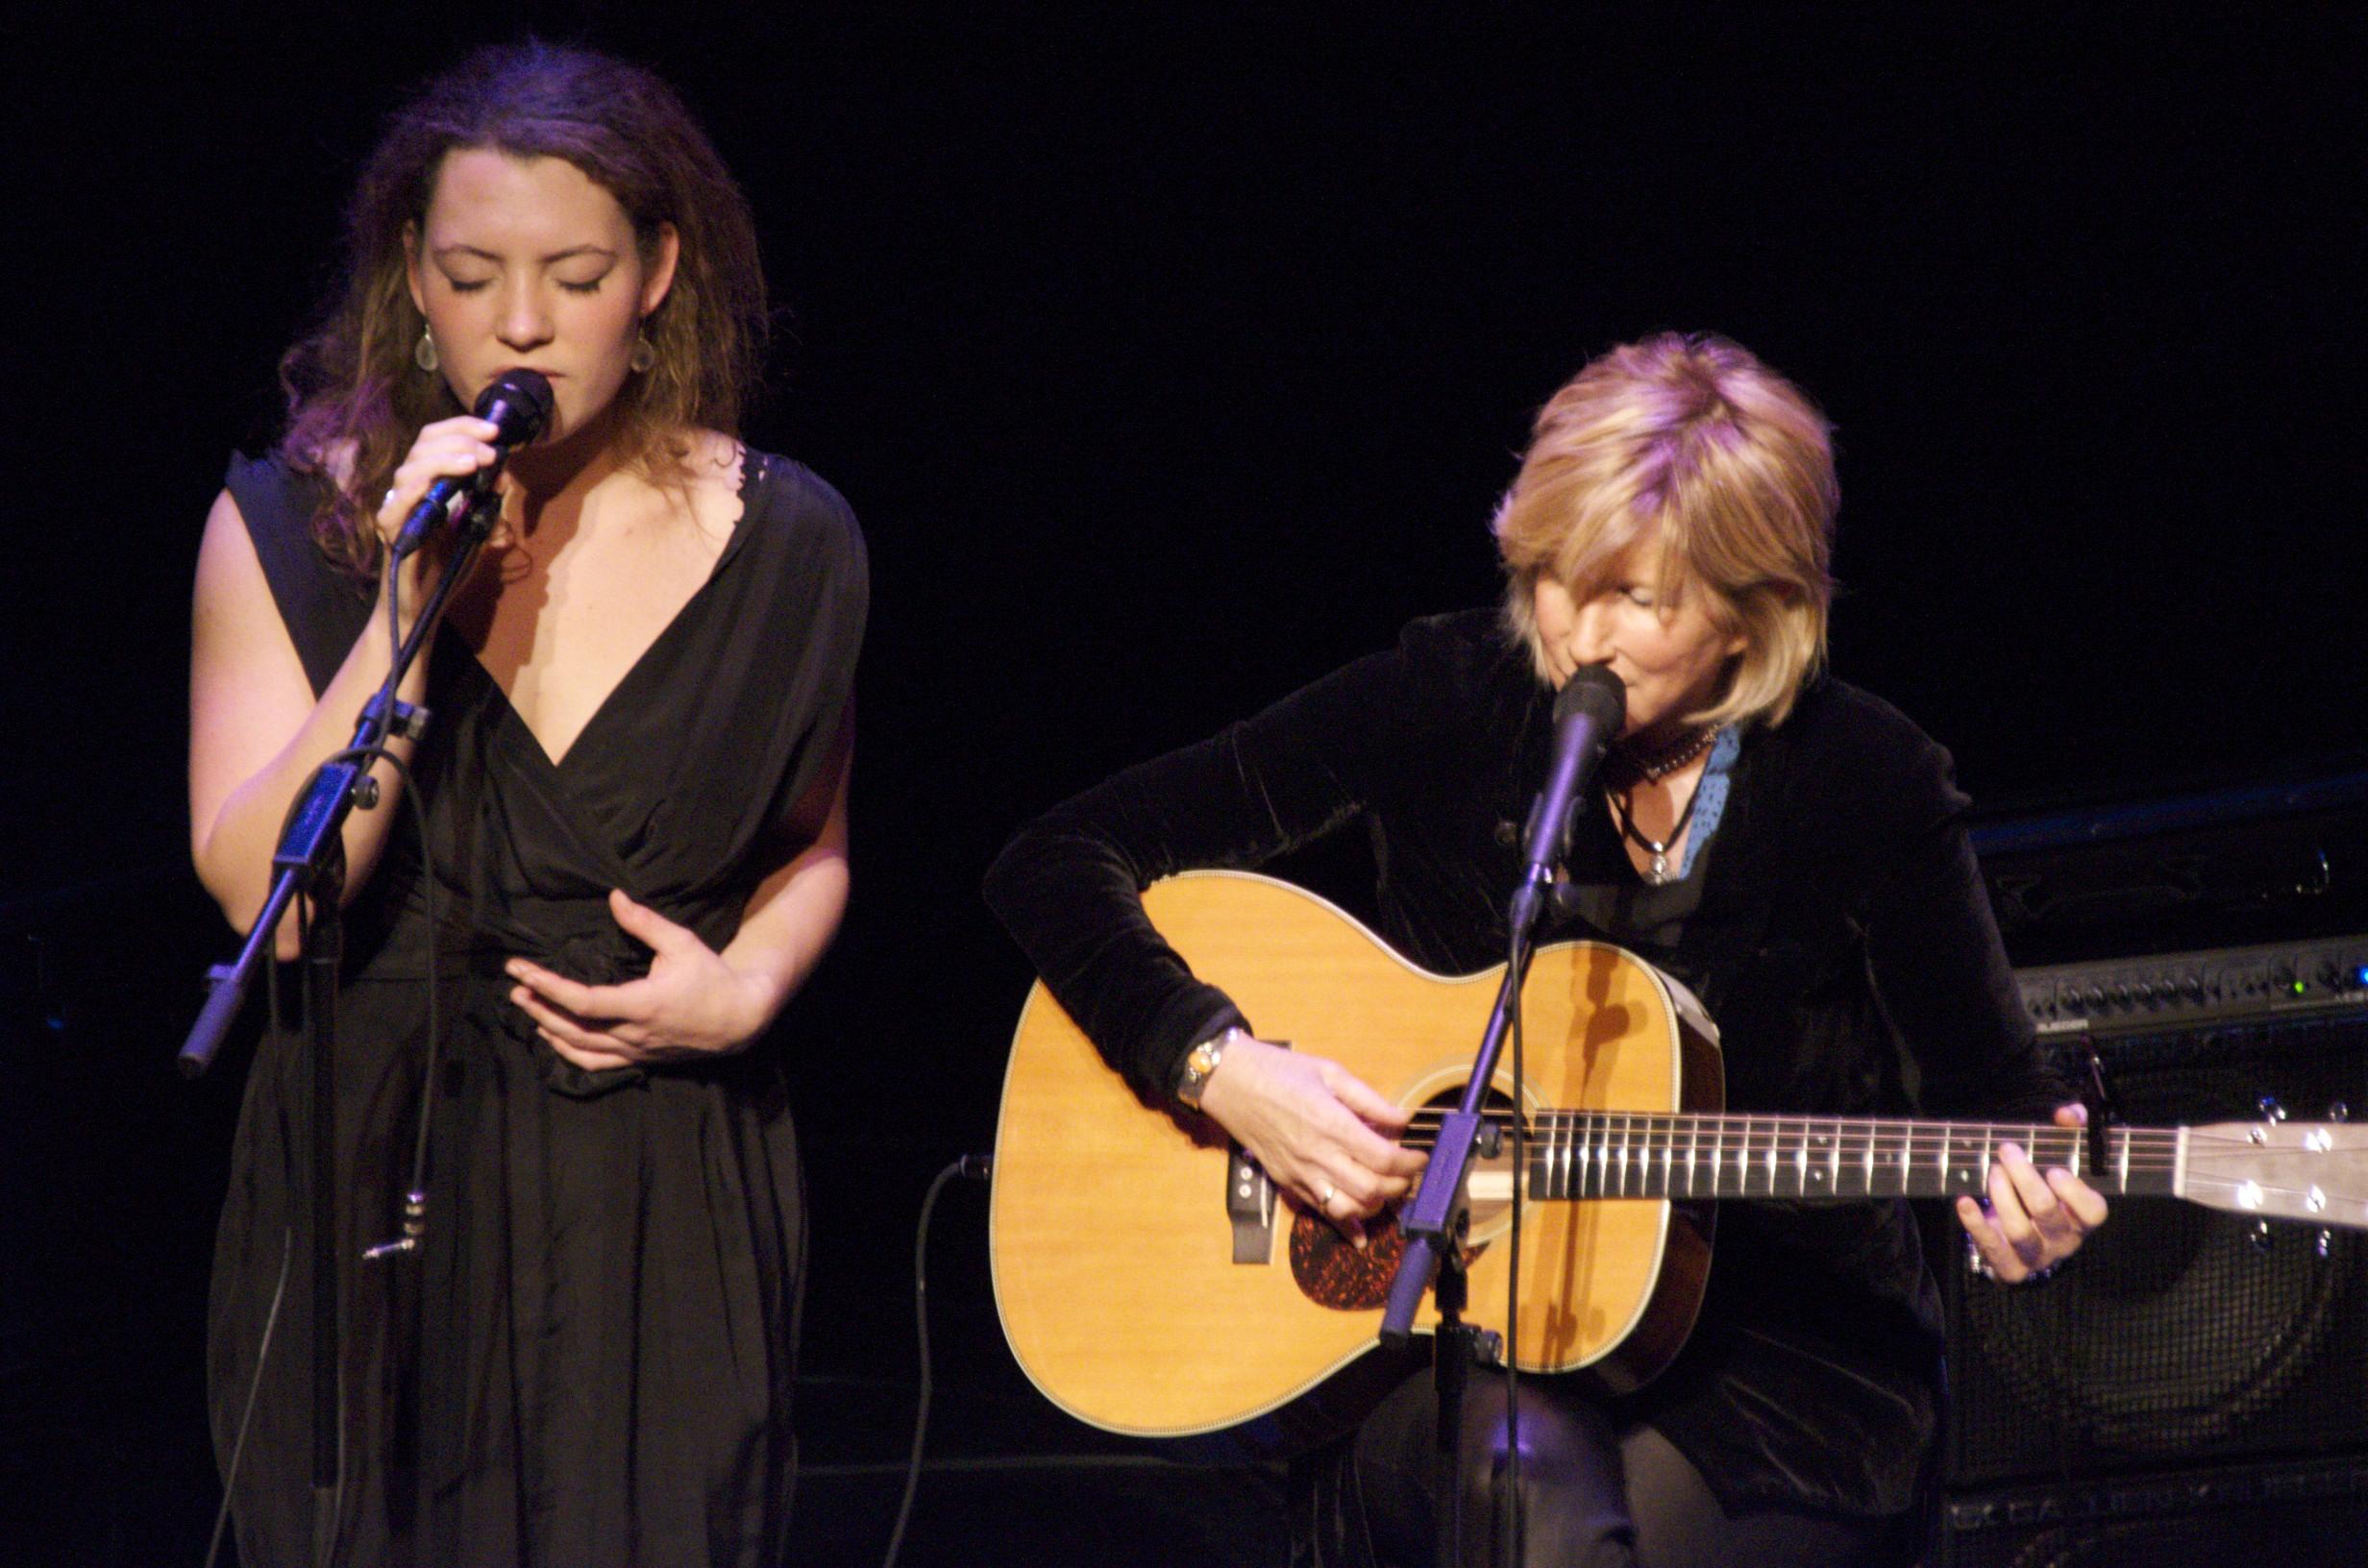 Lori with the wonderful Dutch artist, Celine Cairo, at Theater De Meervaart, NL